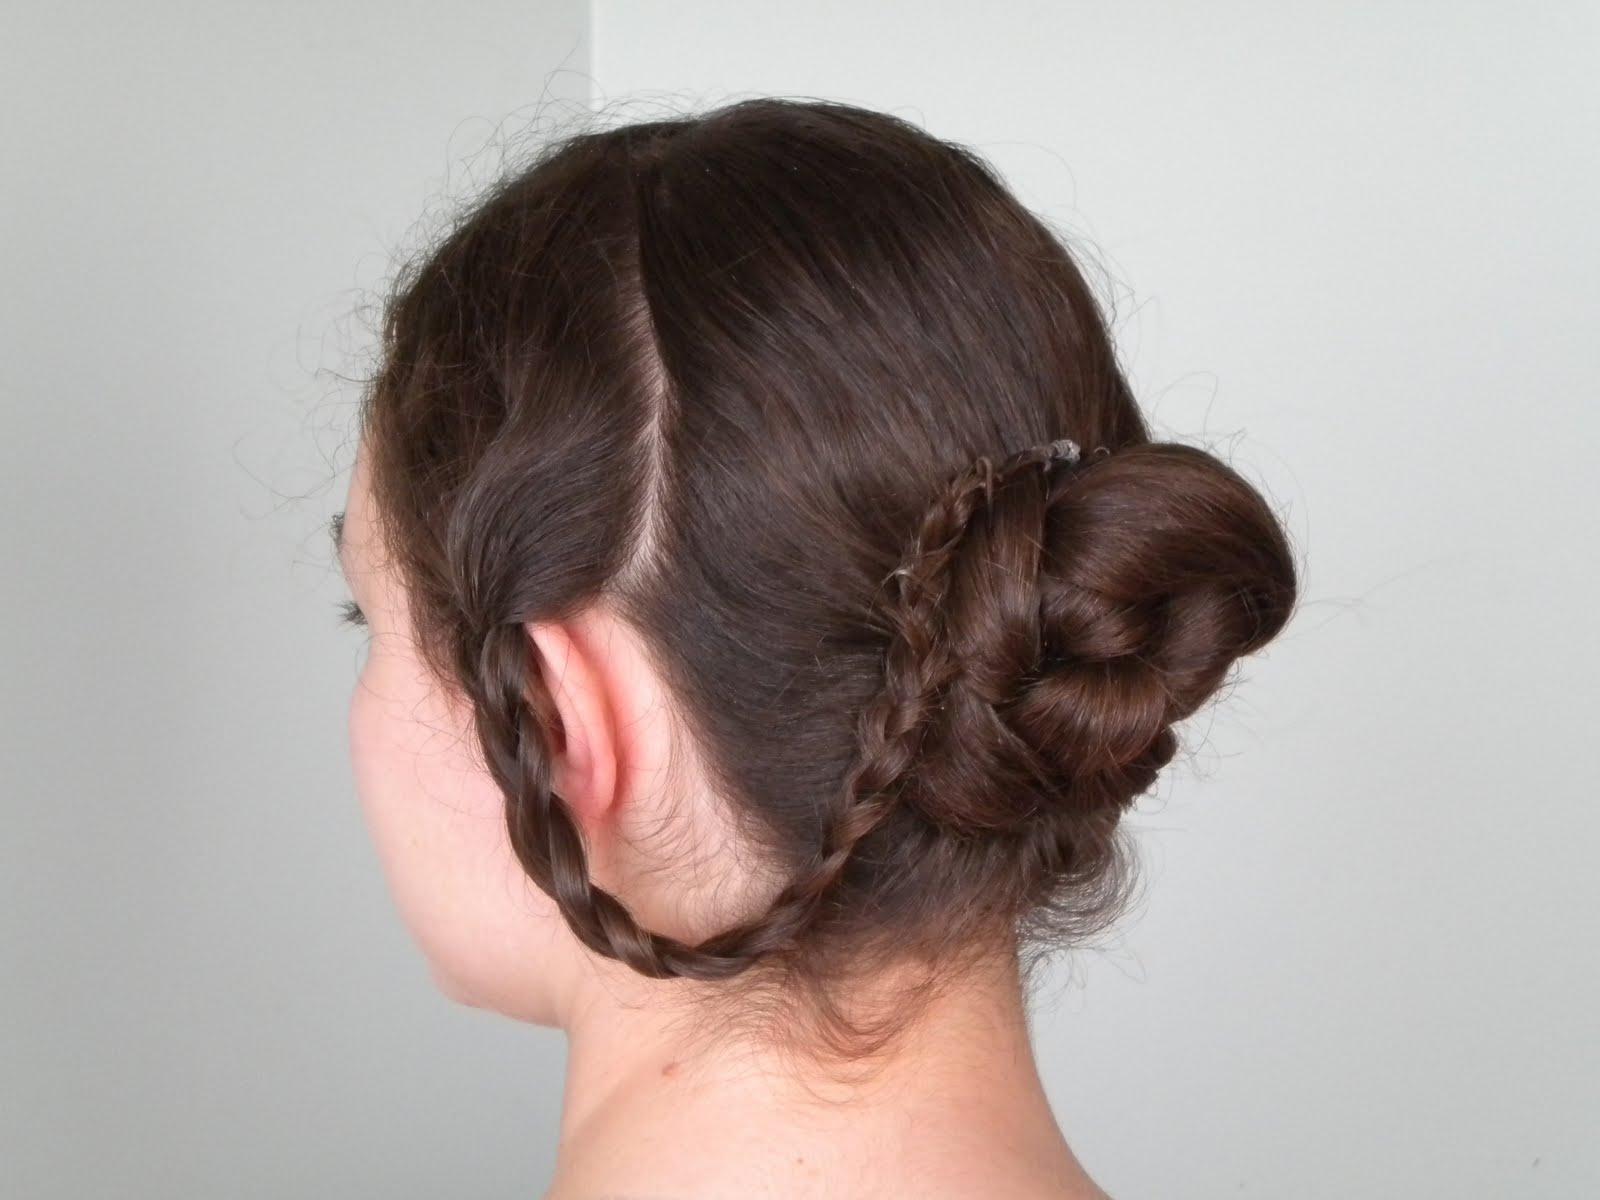 Styles Hair: Hair Styles: Braided Victorian Hairstyle